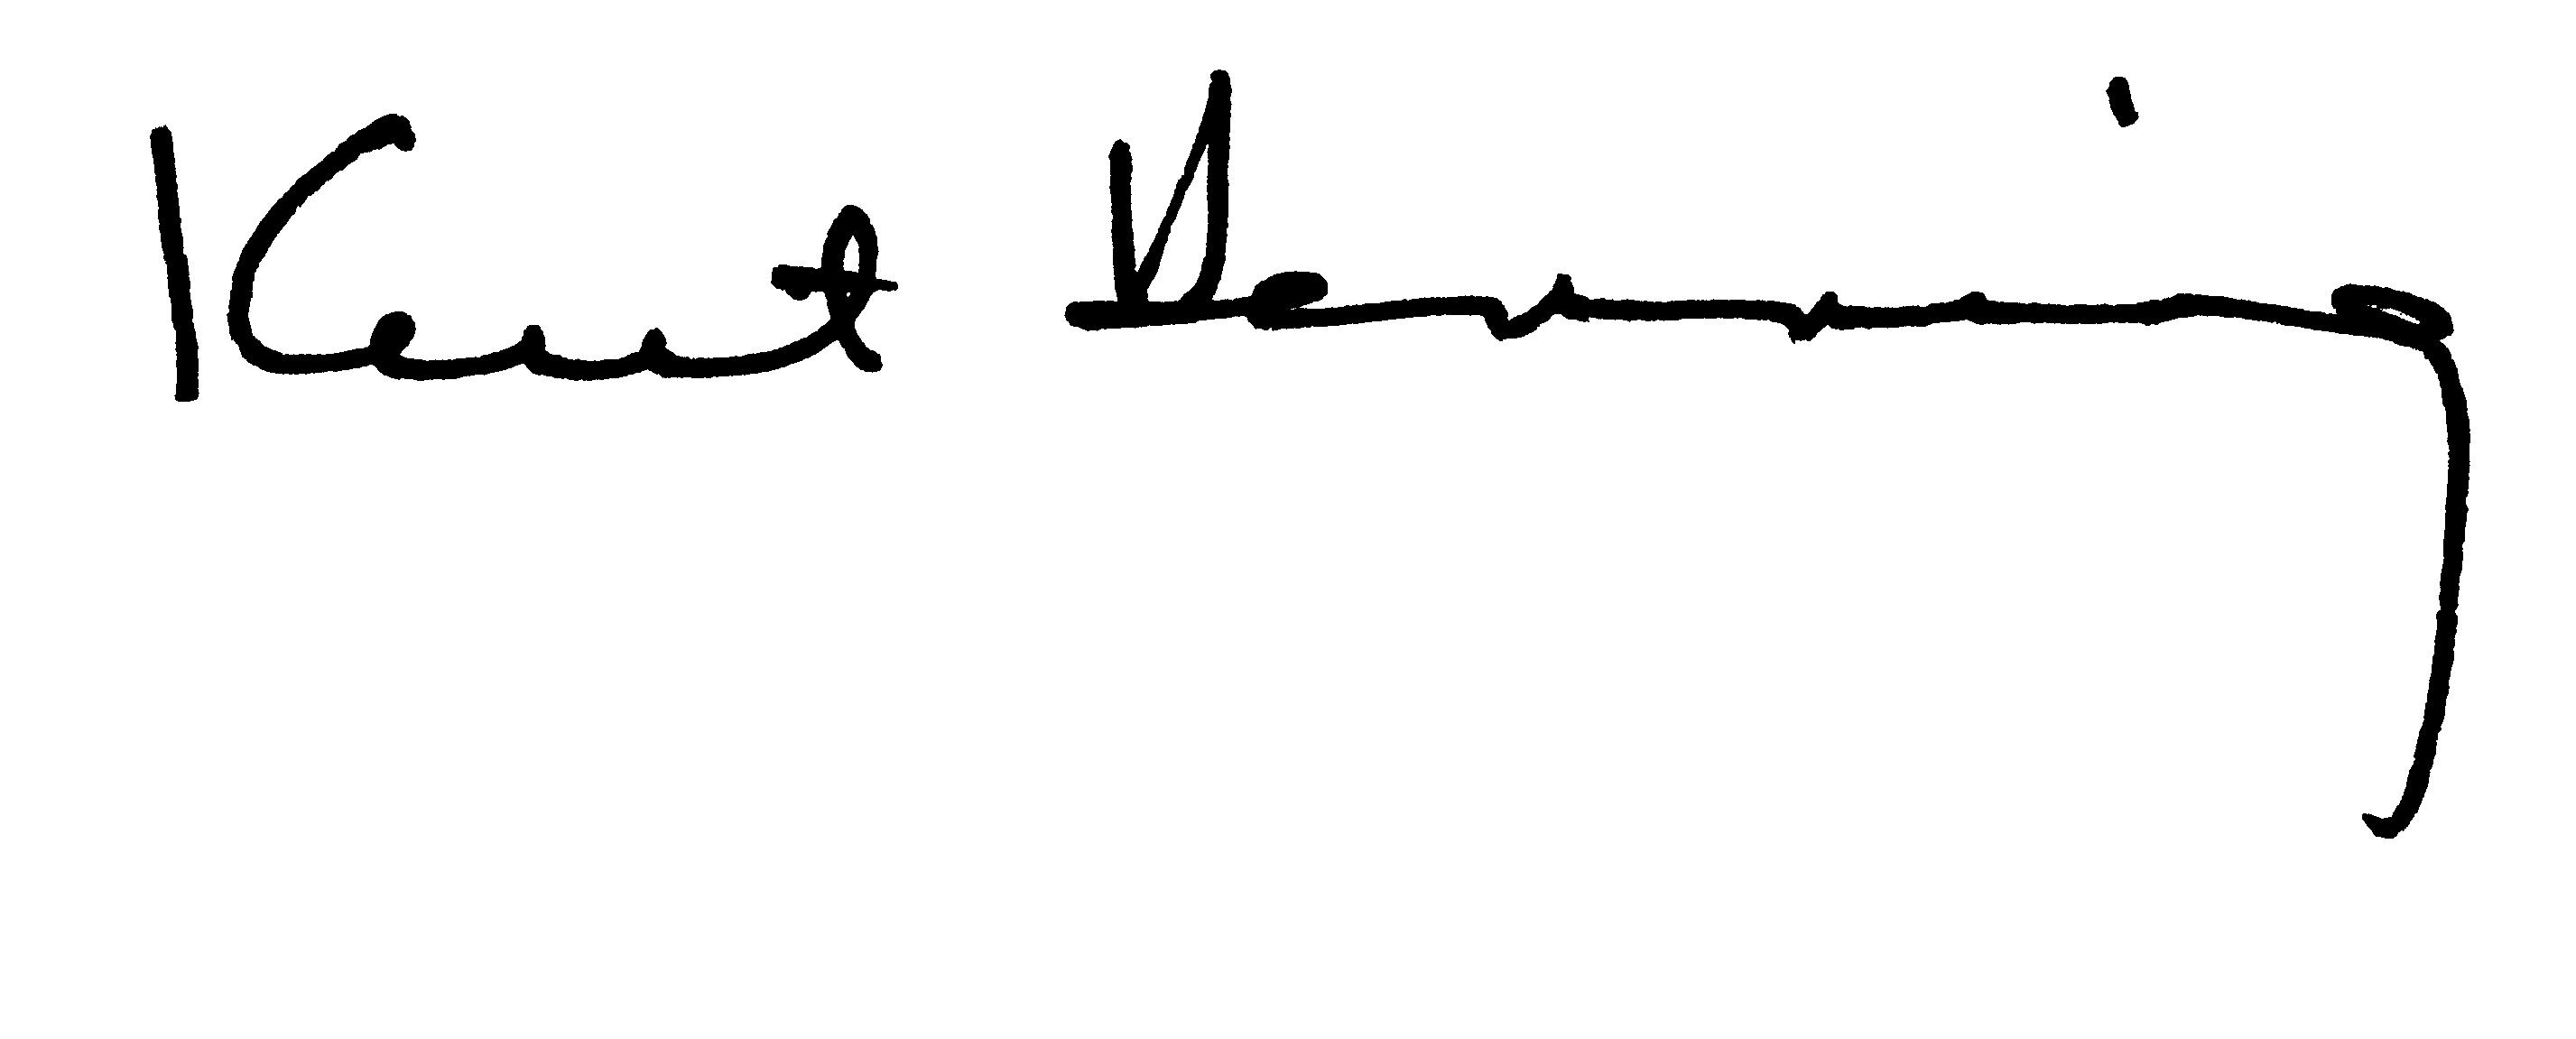 Kent Henning's Signataure